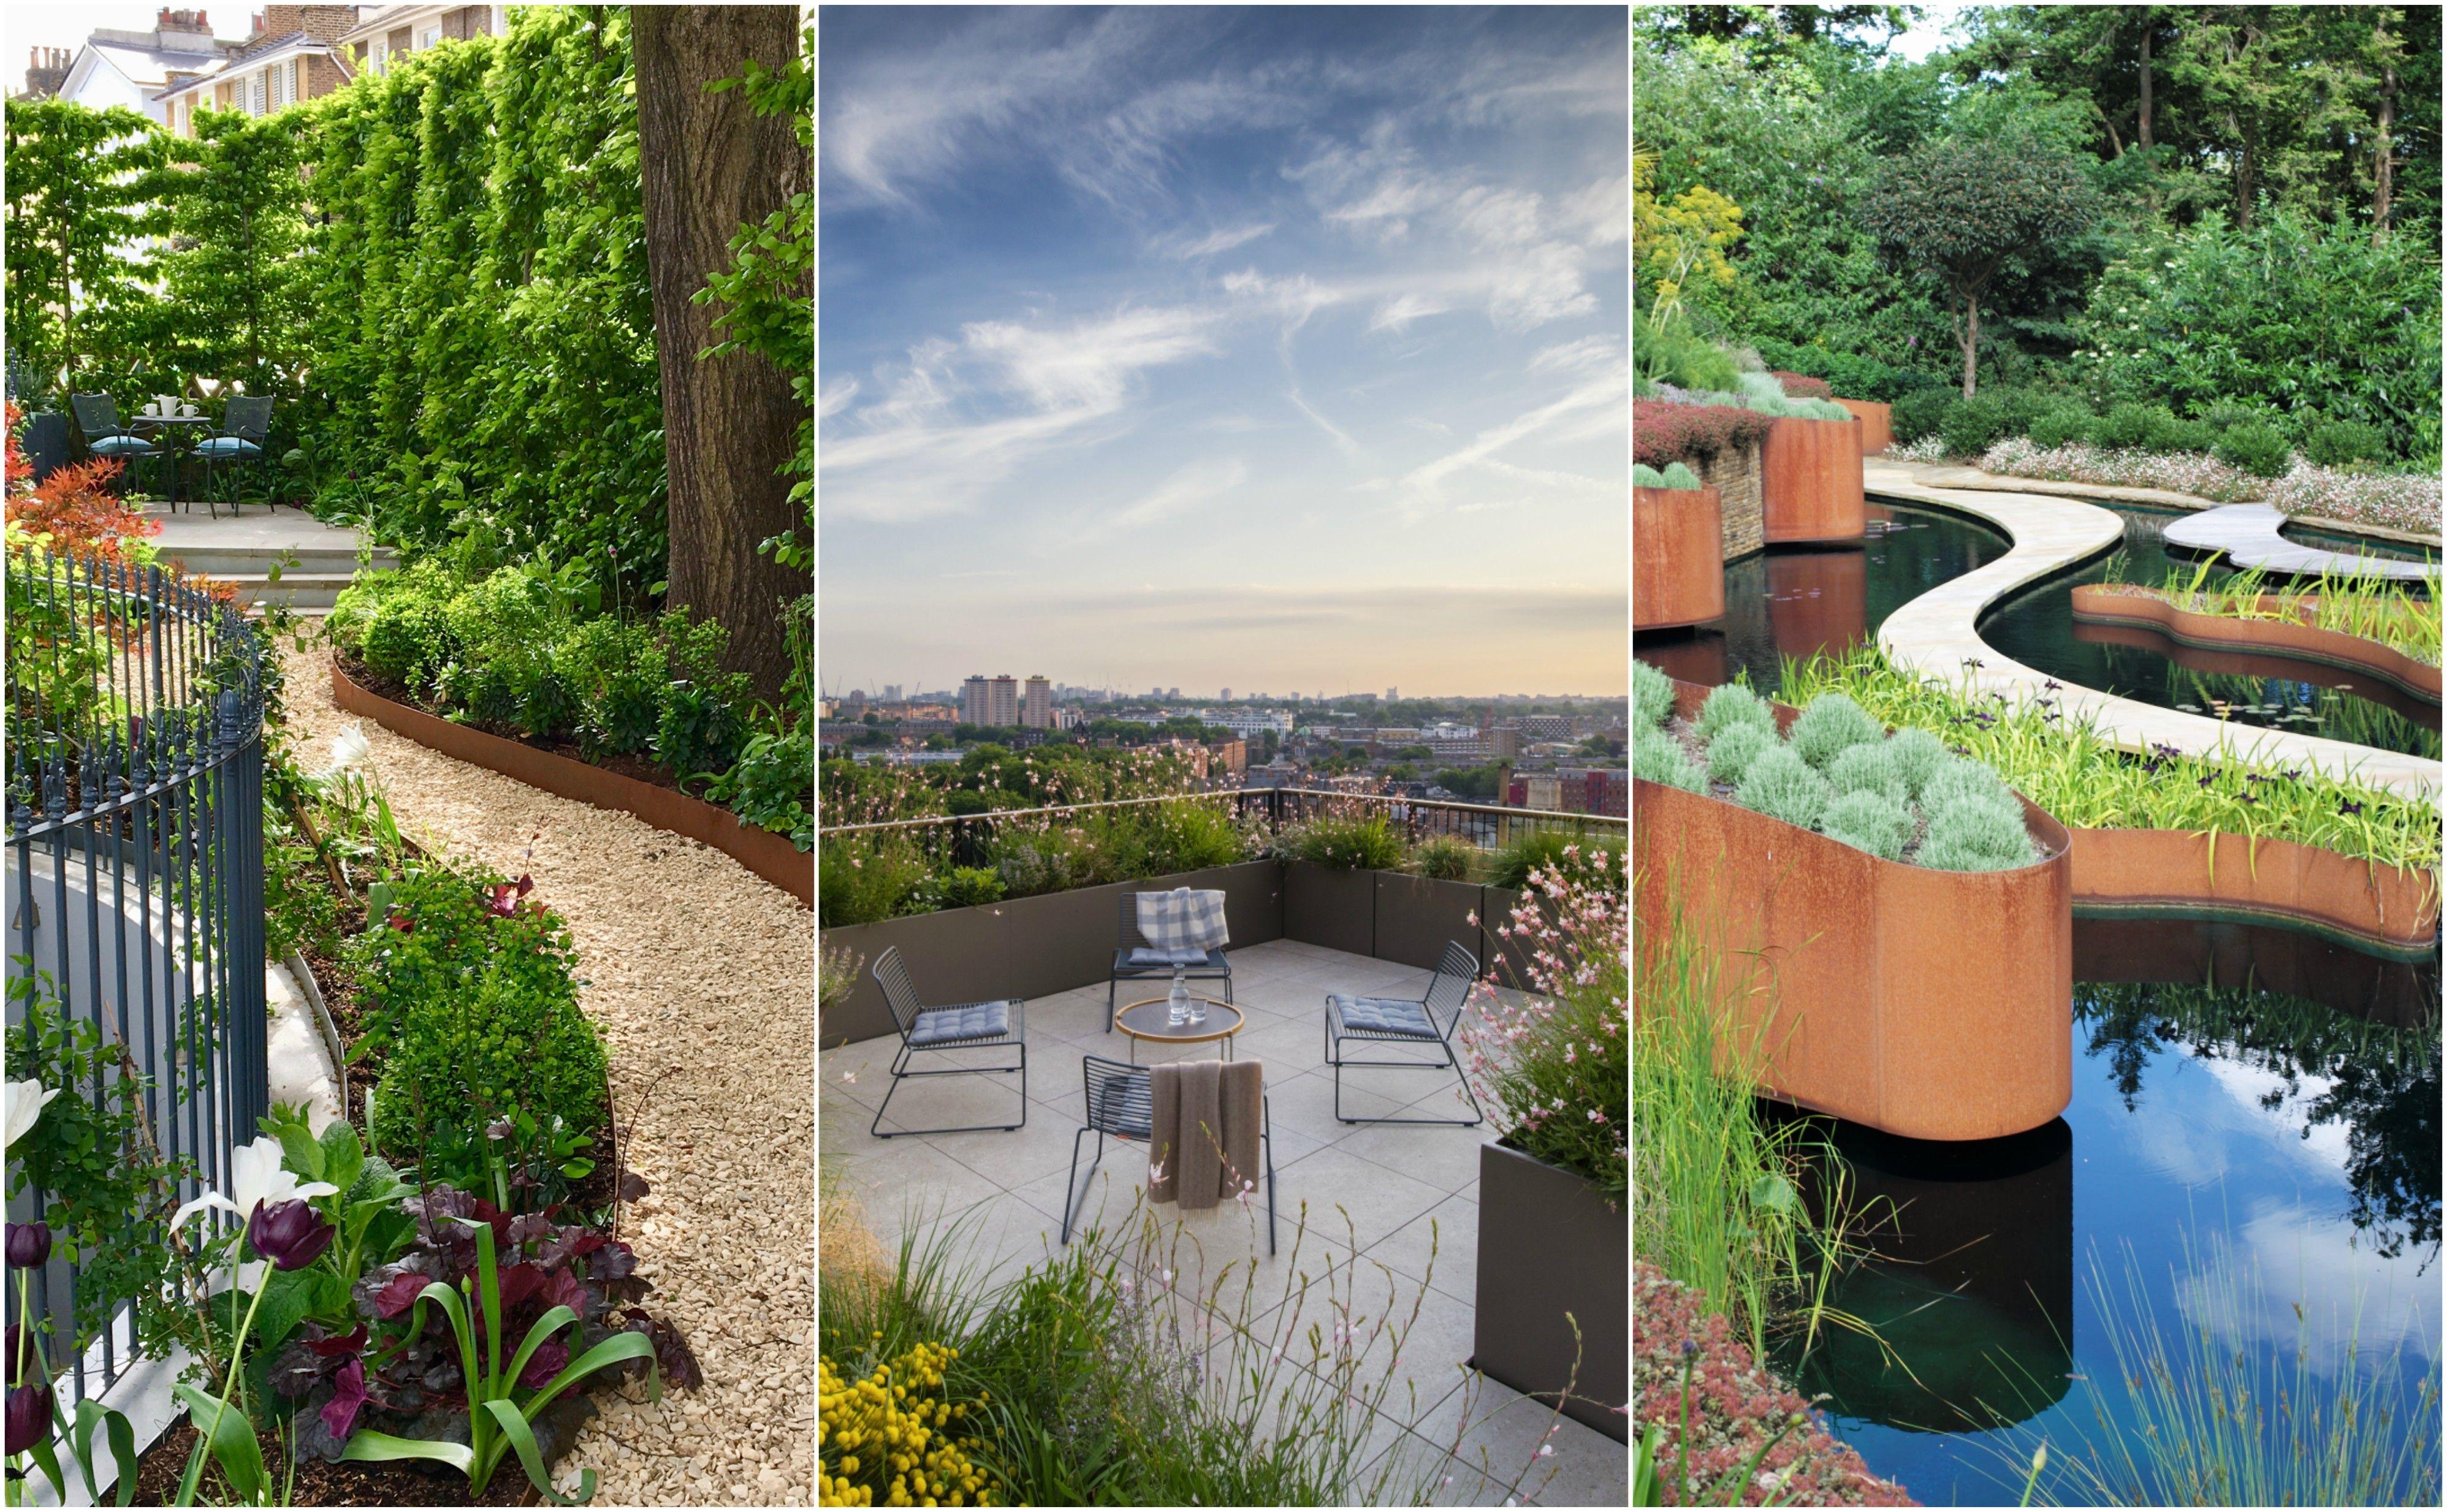 Garden Design Pictures – Winners of The Society of Garden